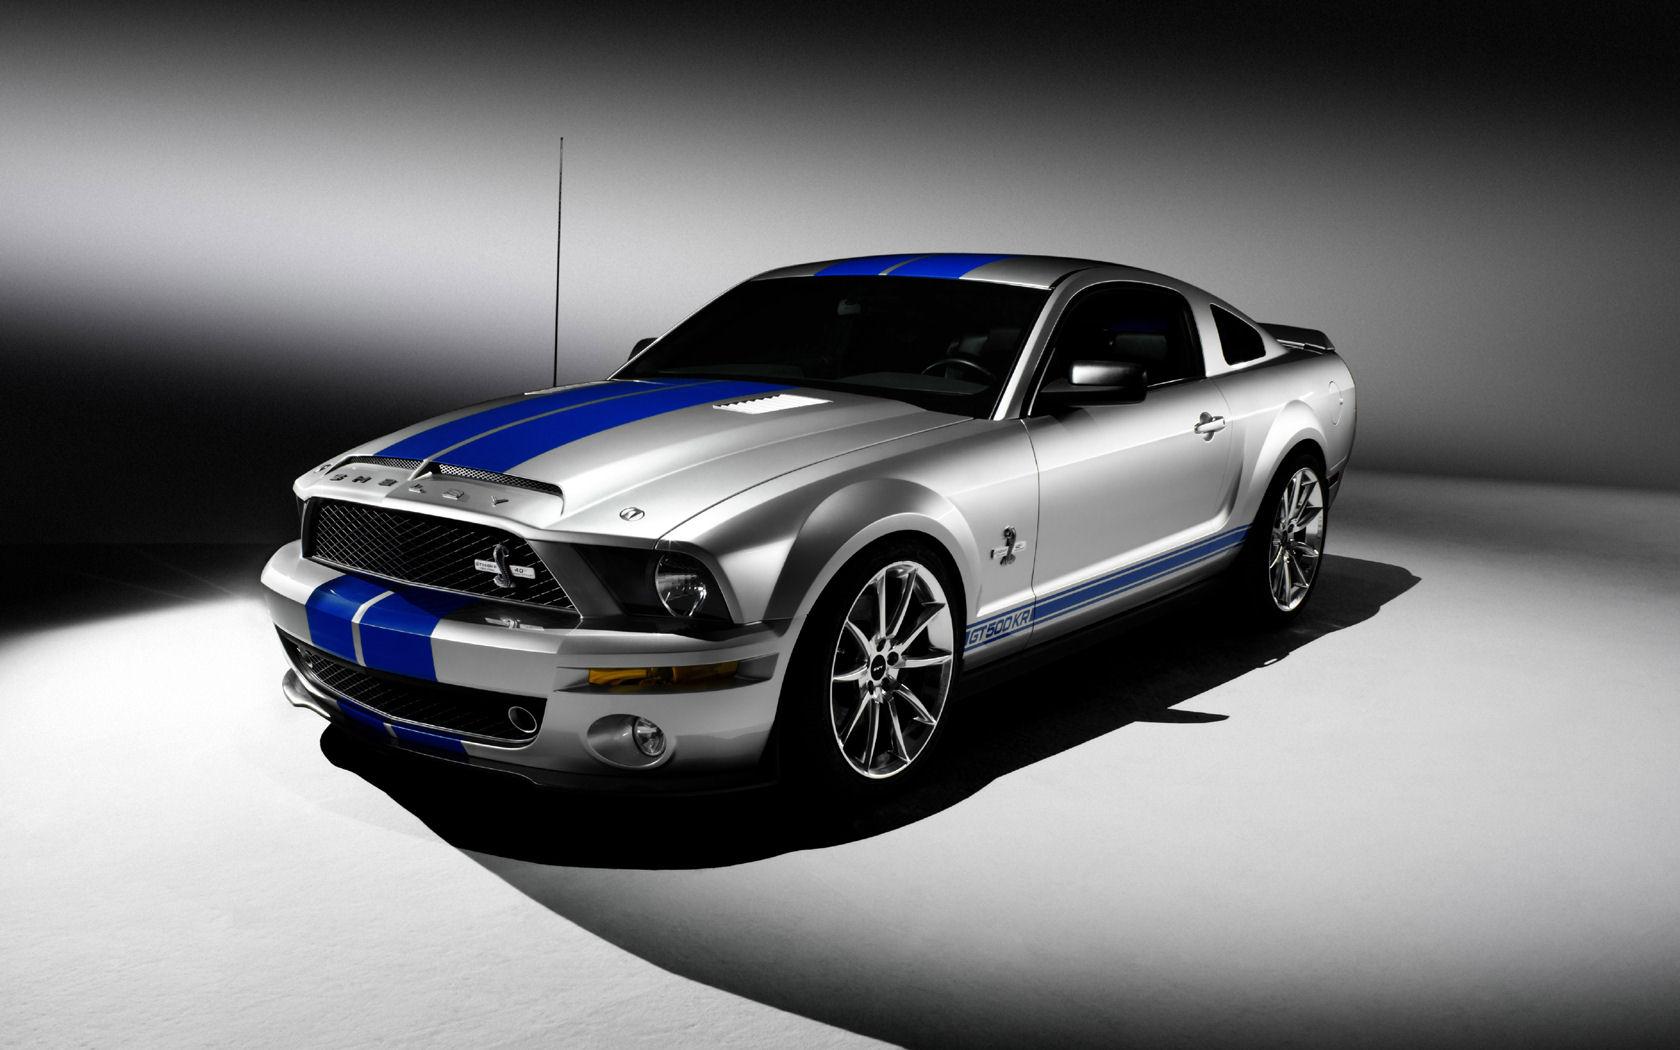 Ford Mustang Wallpaper For Mobile